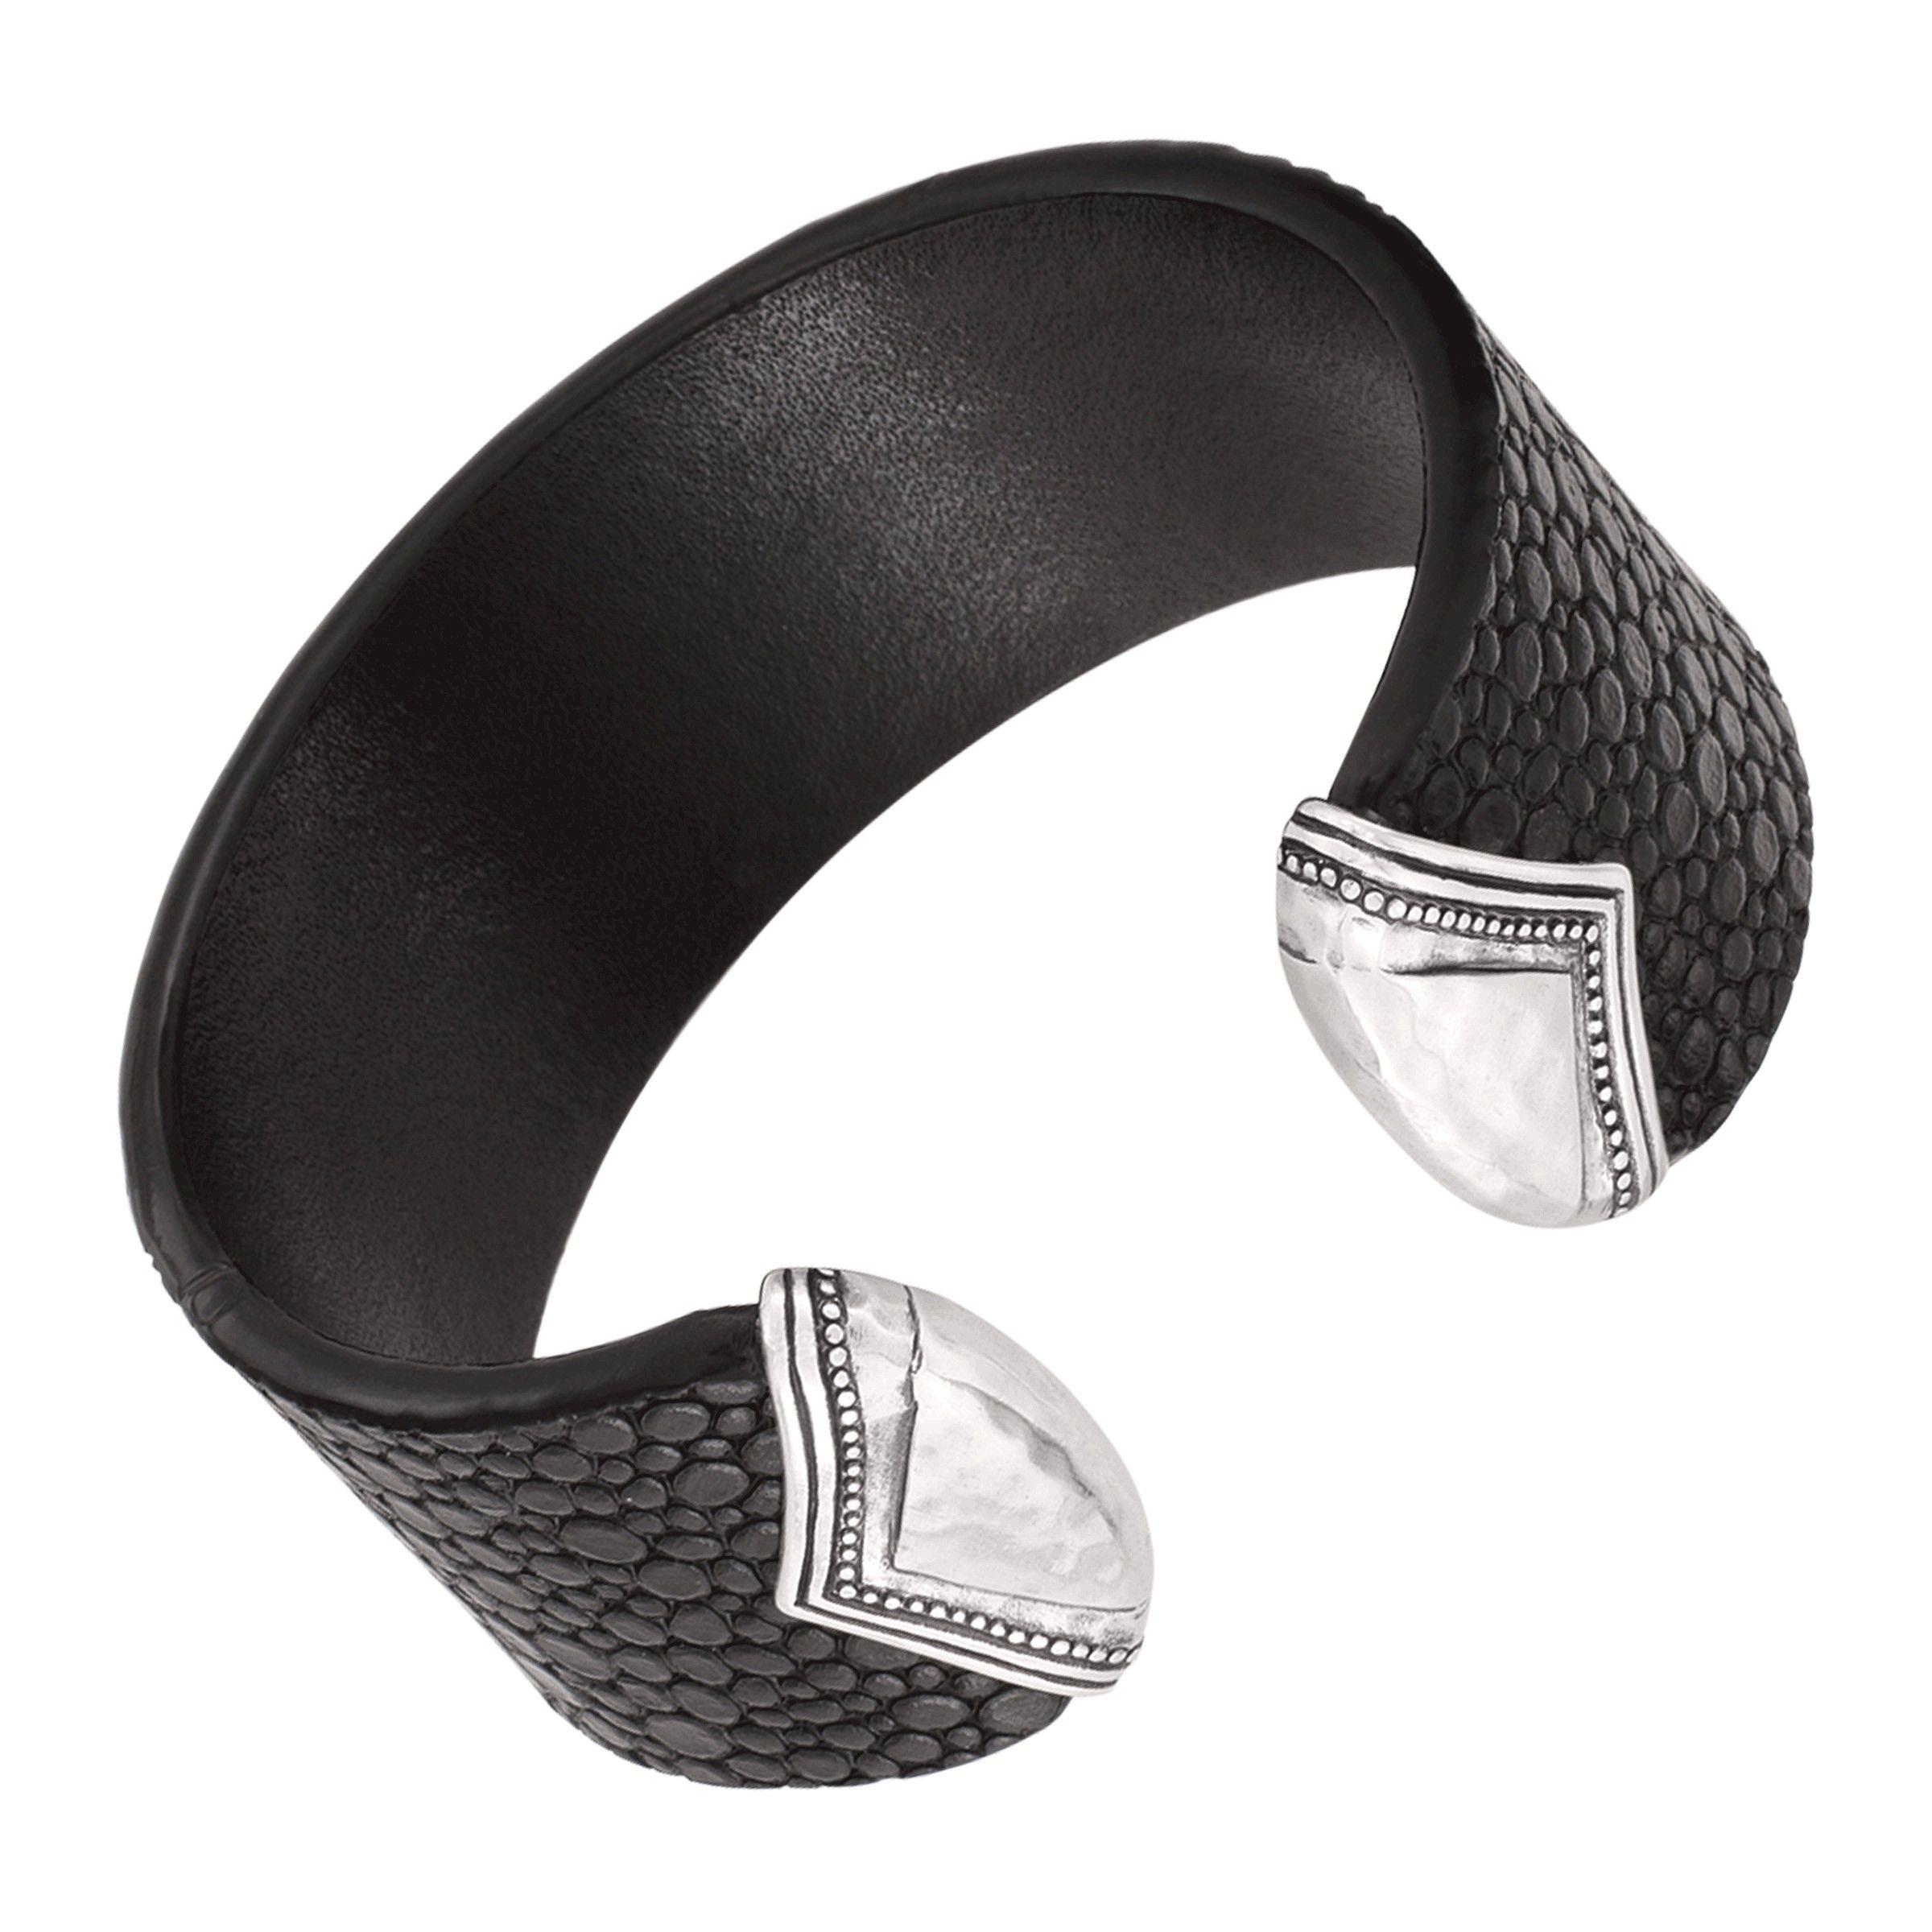 Sterling Silver Stingray Leather Cuff Bracelet Unique Sterling Silver Jewelry Black Cuff Bracelet Designer Sterling Cuff Bracelet